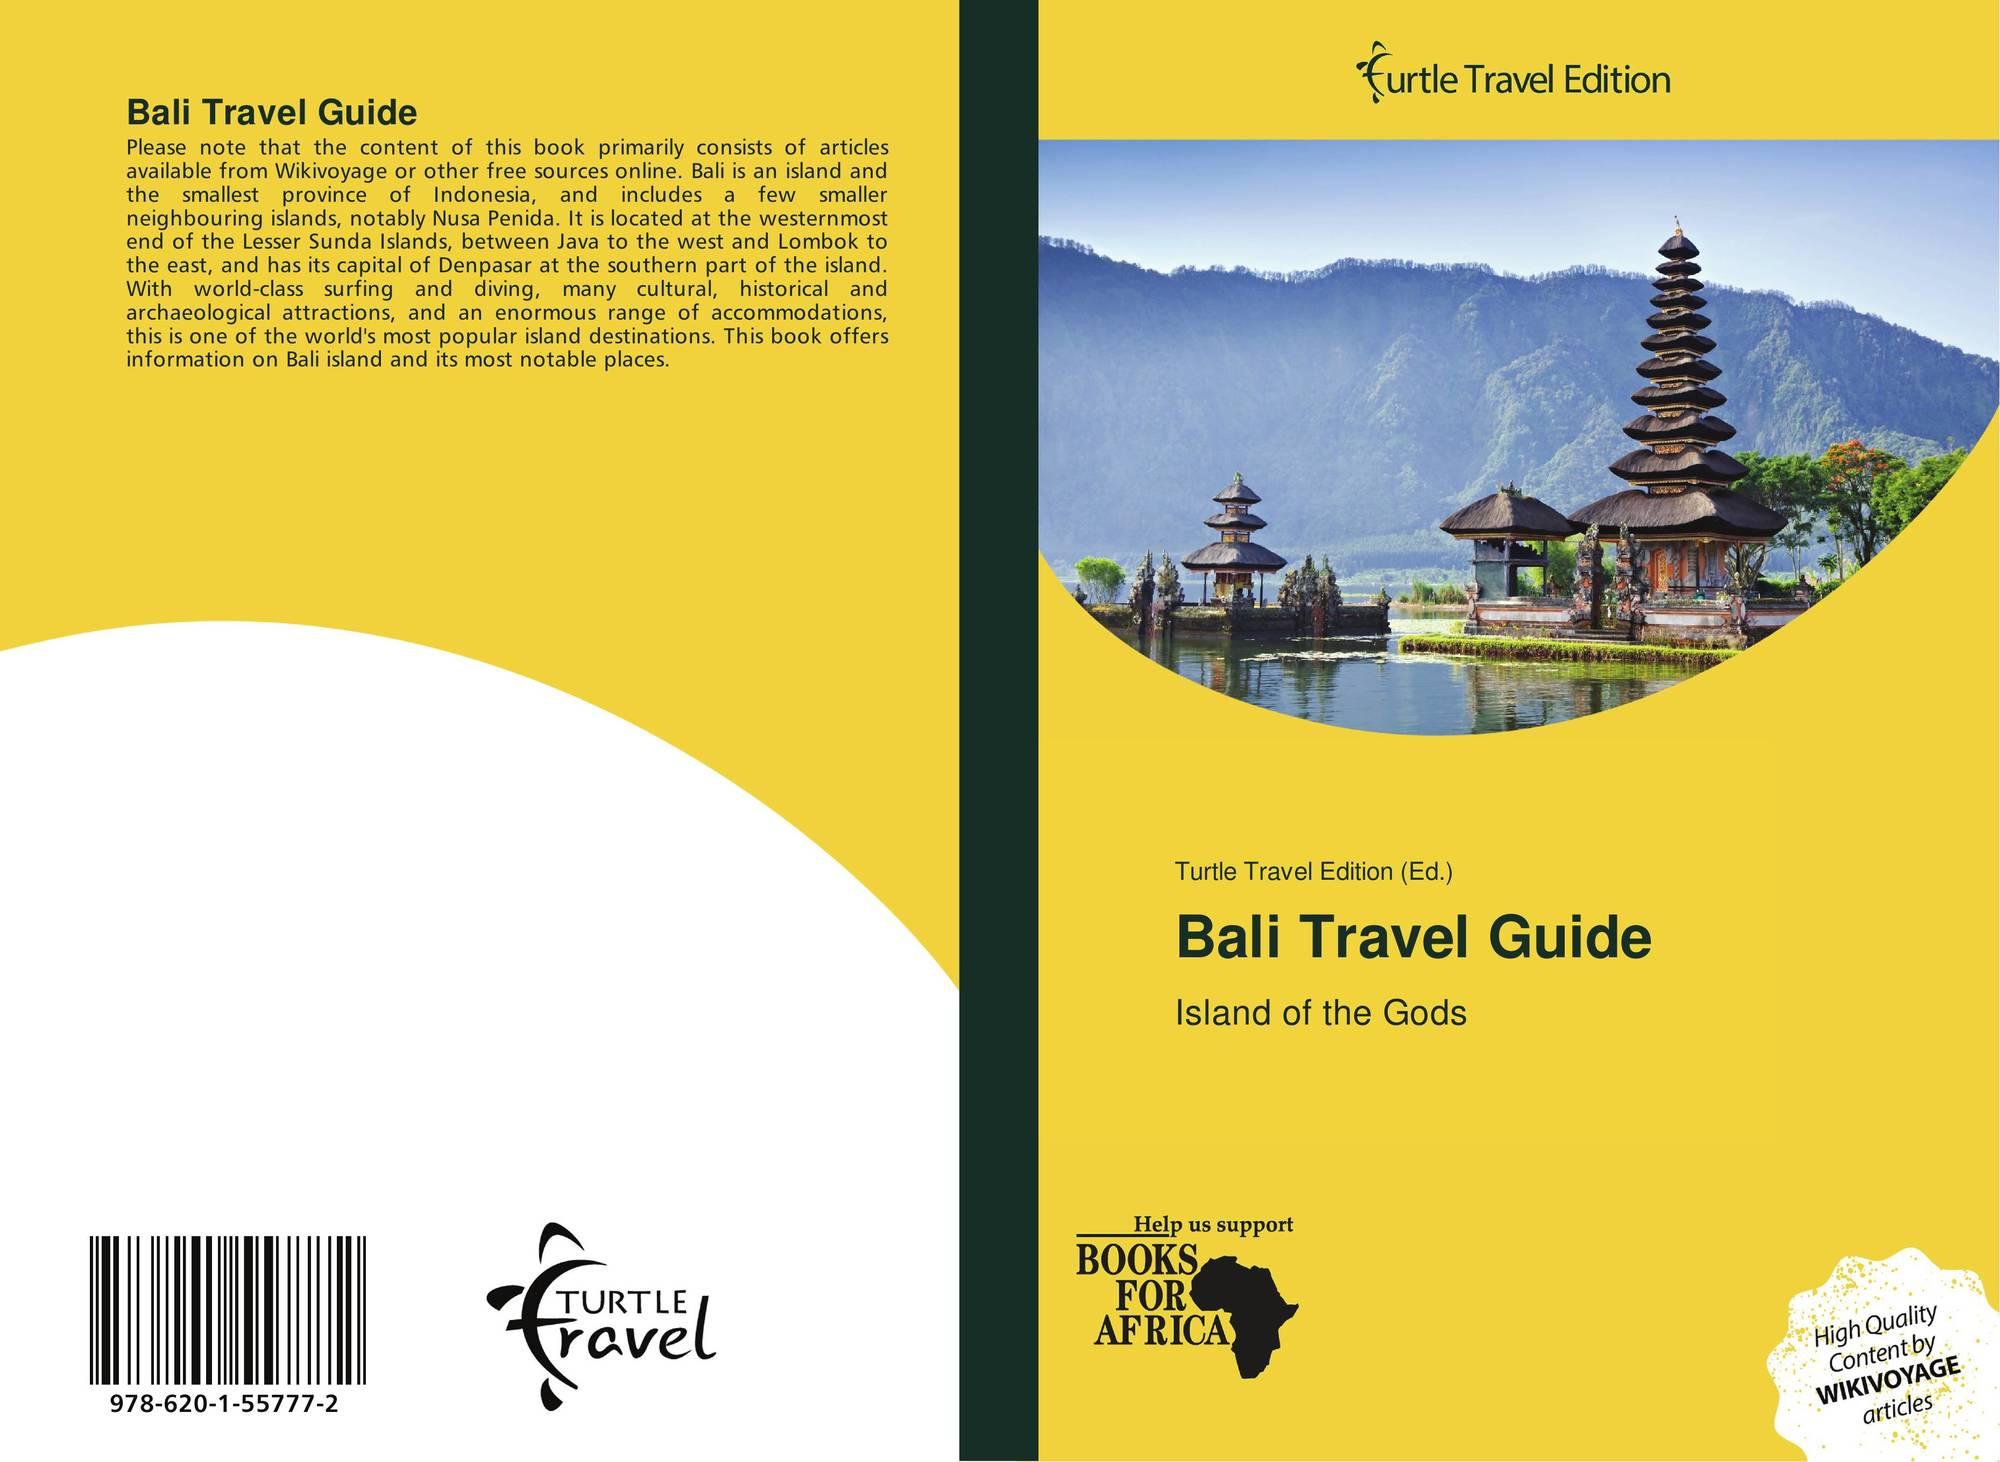 Bali Travel Guide 978 620 1 55777 2 6201557776 9786201557772